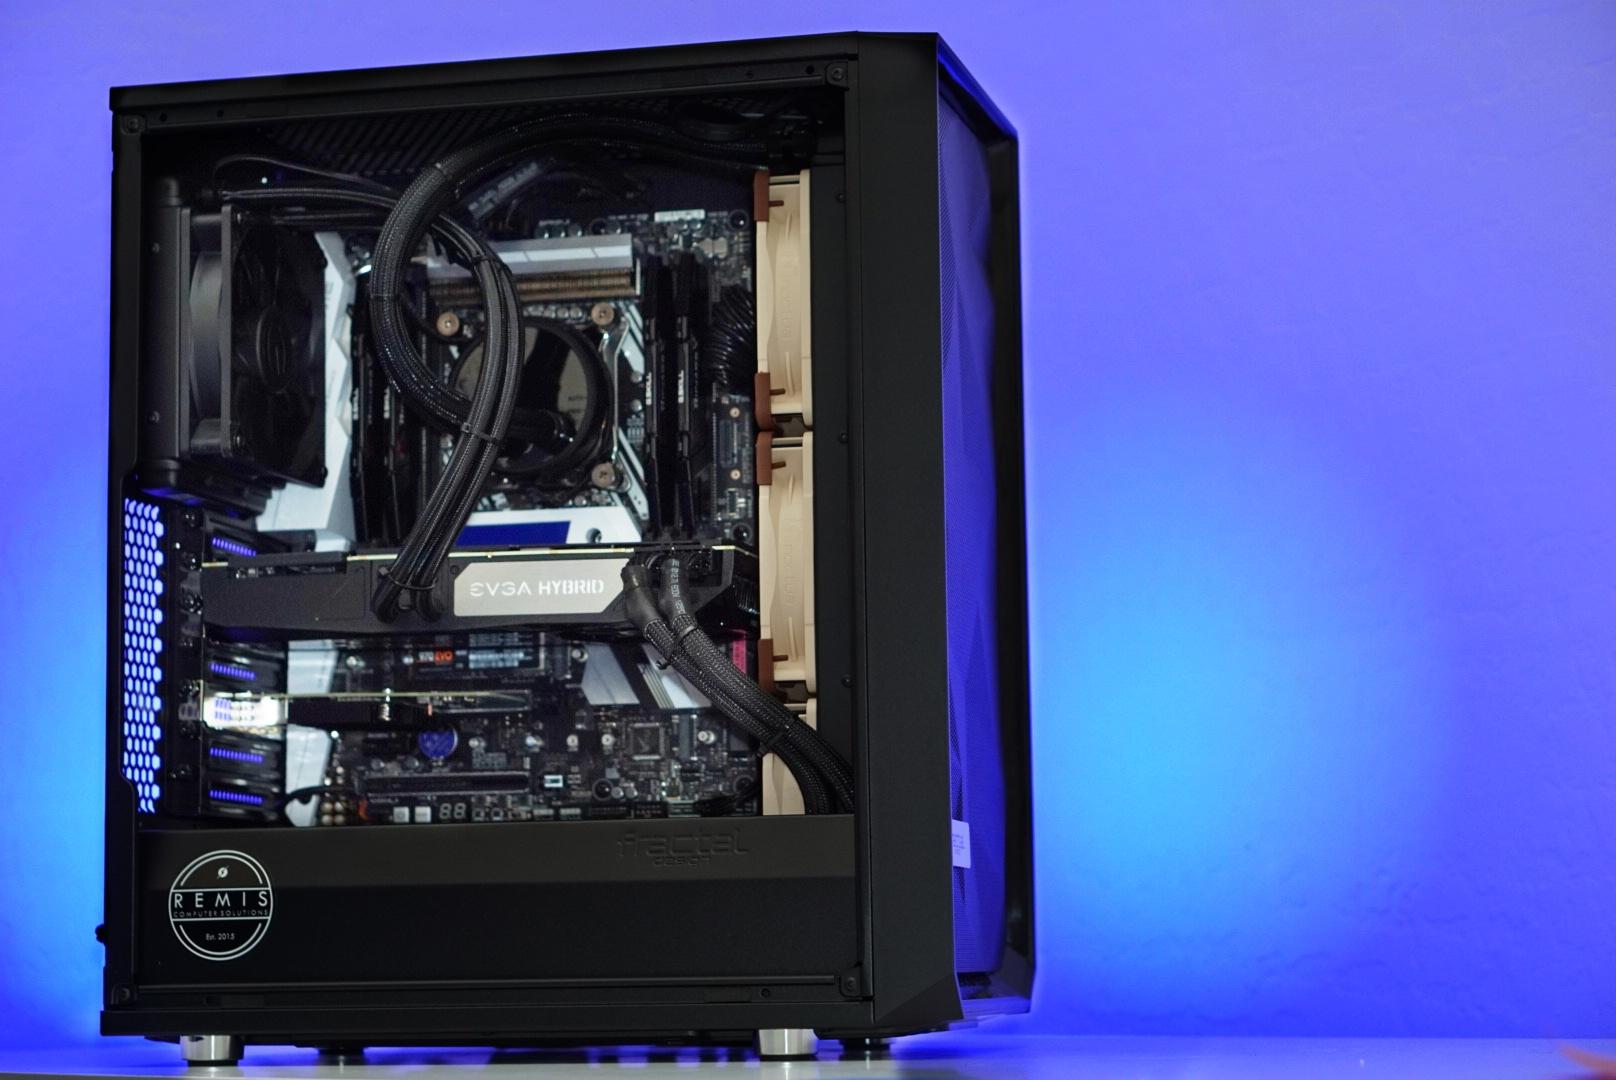 Popular Configuration - Case: Fractal Design Define C ATXCPU: Intel i9 9940x 14 core/ 28 threadMotherboard: Asus x299 Deluxe-ii ATXRAM: Corsair LPX 64GB 3200mhz (4x16GB)Video Card: Nvidia RTX 2060 SUPER 8GBCPU Cooler: Be Quiet! Dark Rock Pro 4 Air CoolerStorage: Samsung 970 PRO 1TB NVMEPower Supply: EVGA G3 850watt GoldOperating System: Windows 10 PRO 64bitPRICE: $5453 + Shipping & Tax(MANY Configurations available)